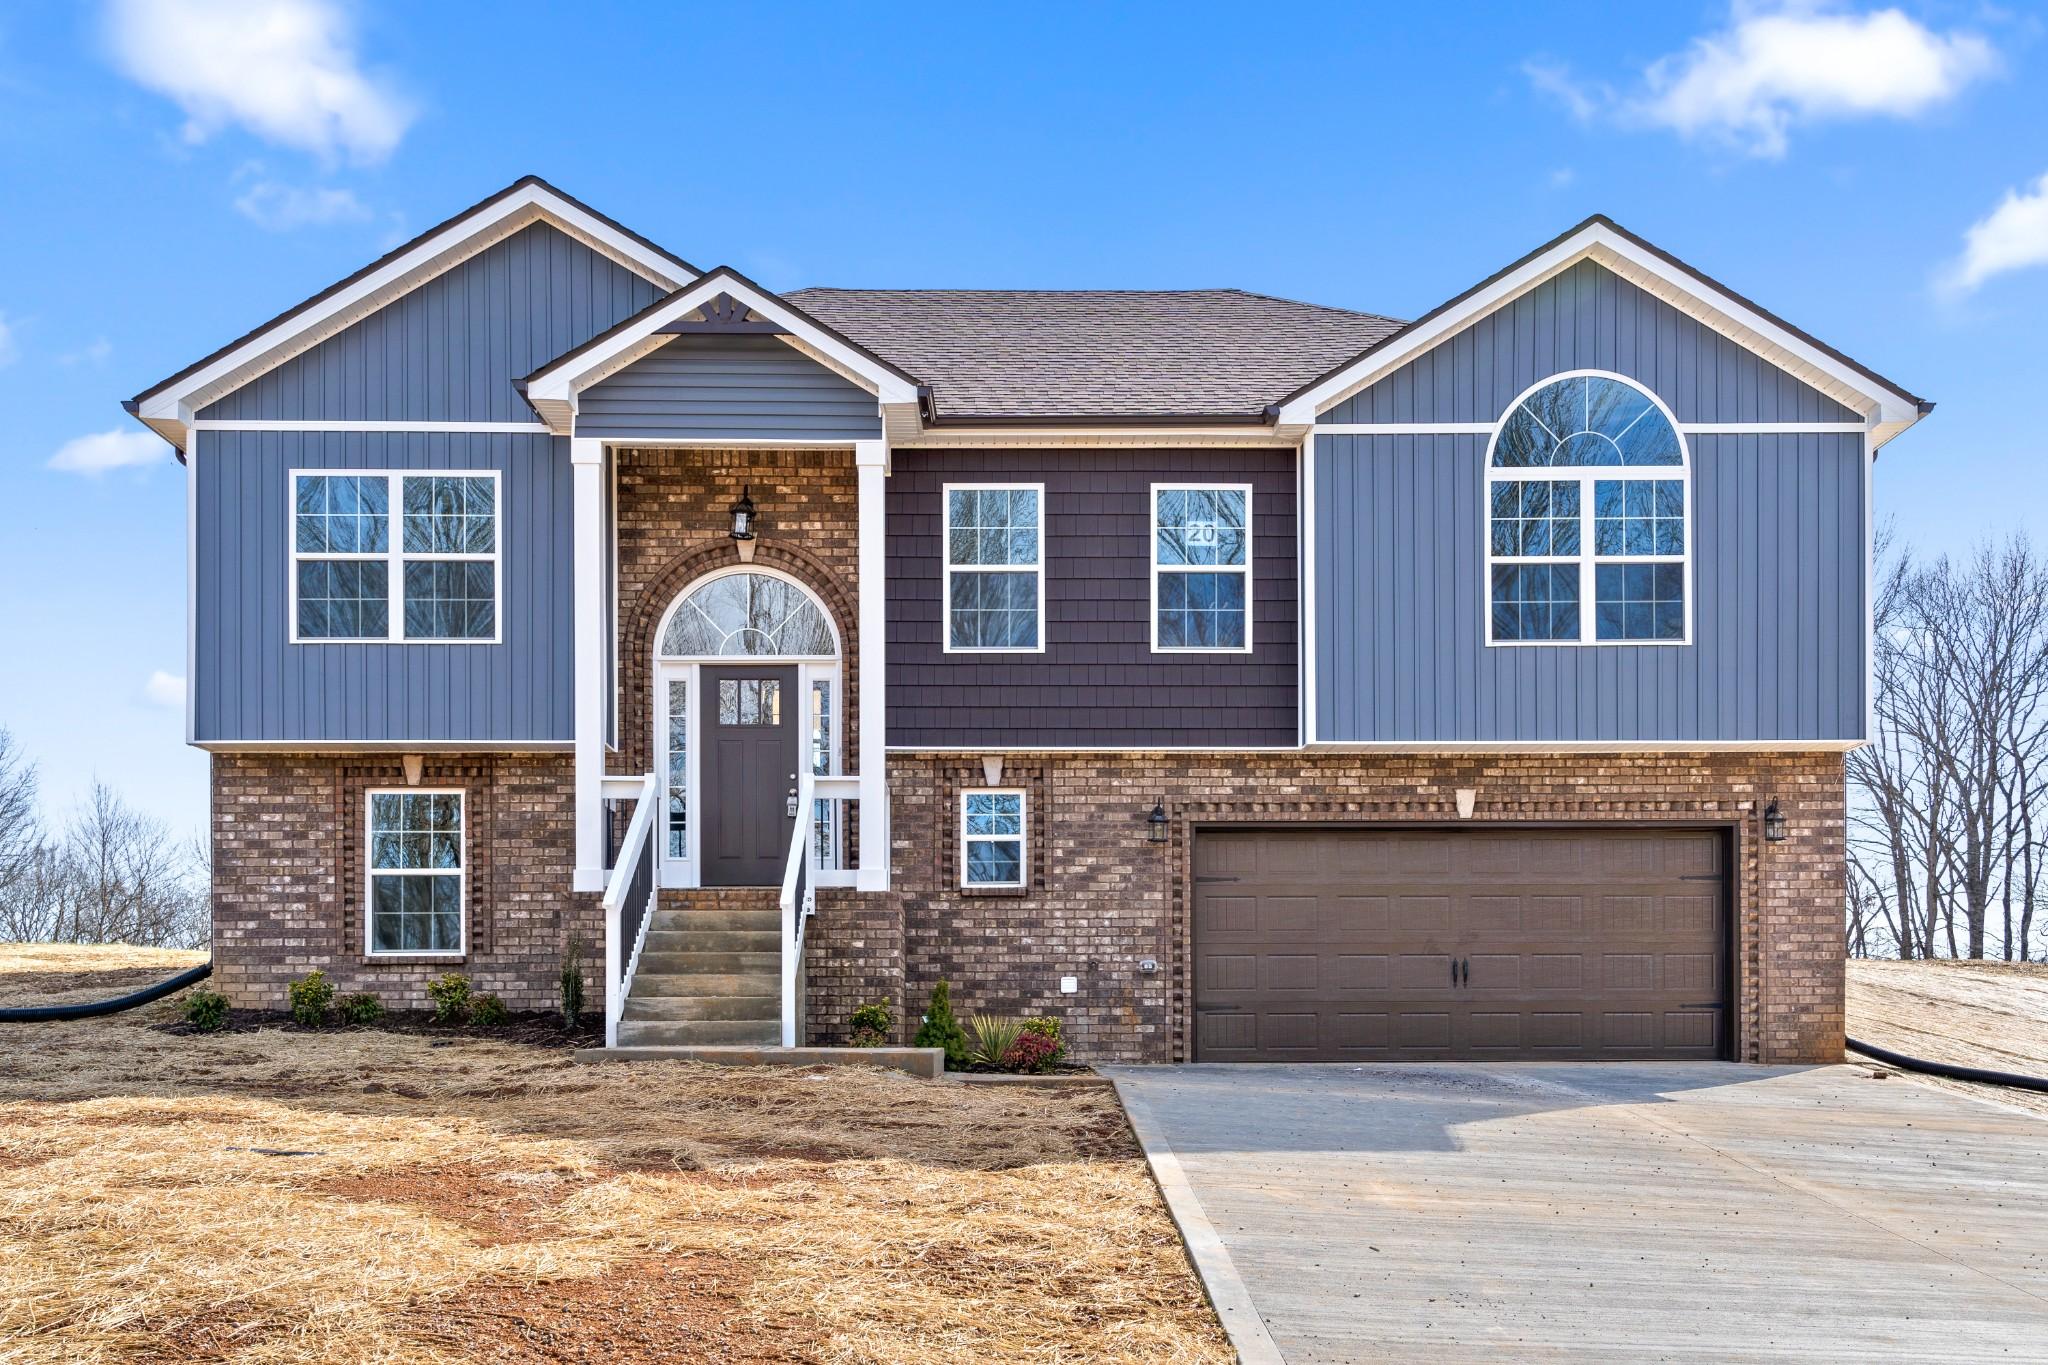 1224 Rich Ellen Drive, Clarksville, TN 37040 - Clarksville, TN real estate listing